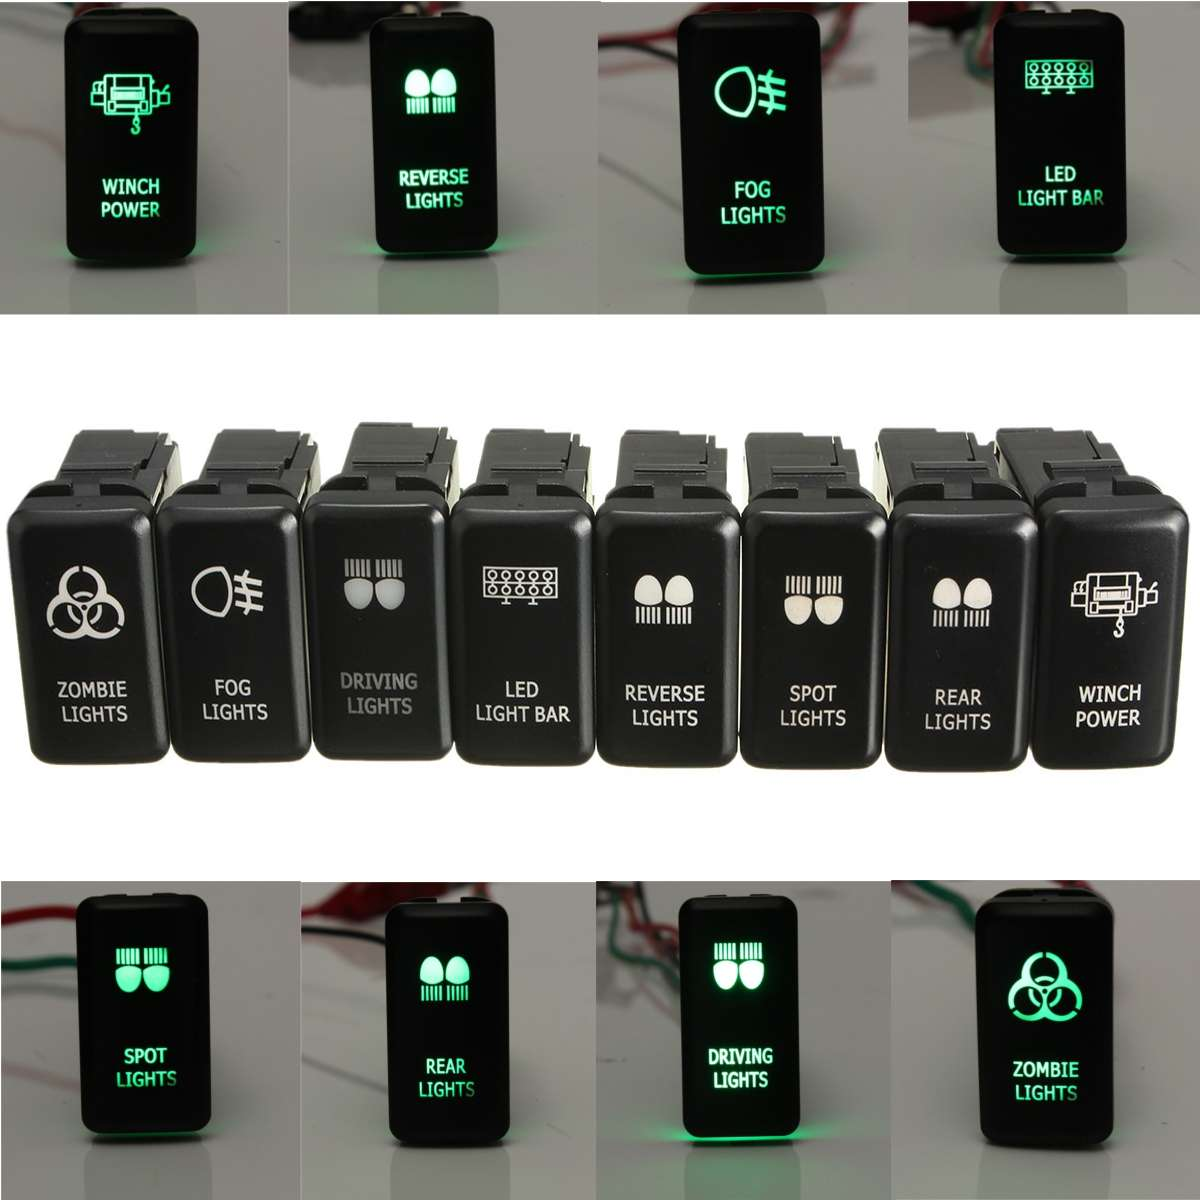 12V สีเขียว LED เปลี่ยน OEM สำหรับ Toyota Landcruiser HILUX Prado 120 SERIES 2003-2009 ไฟ LED light ขับรถ